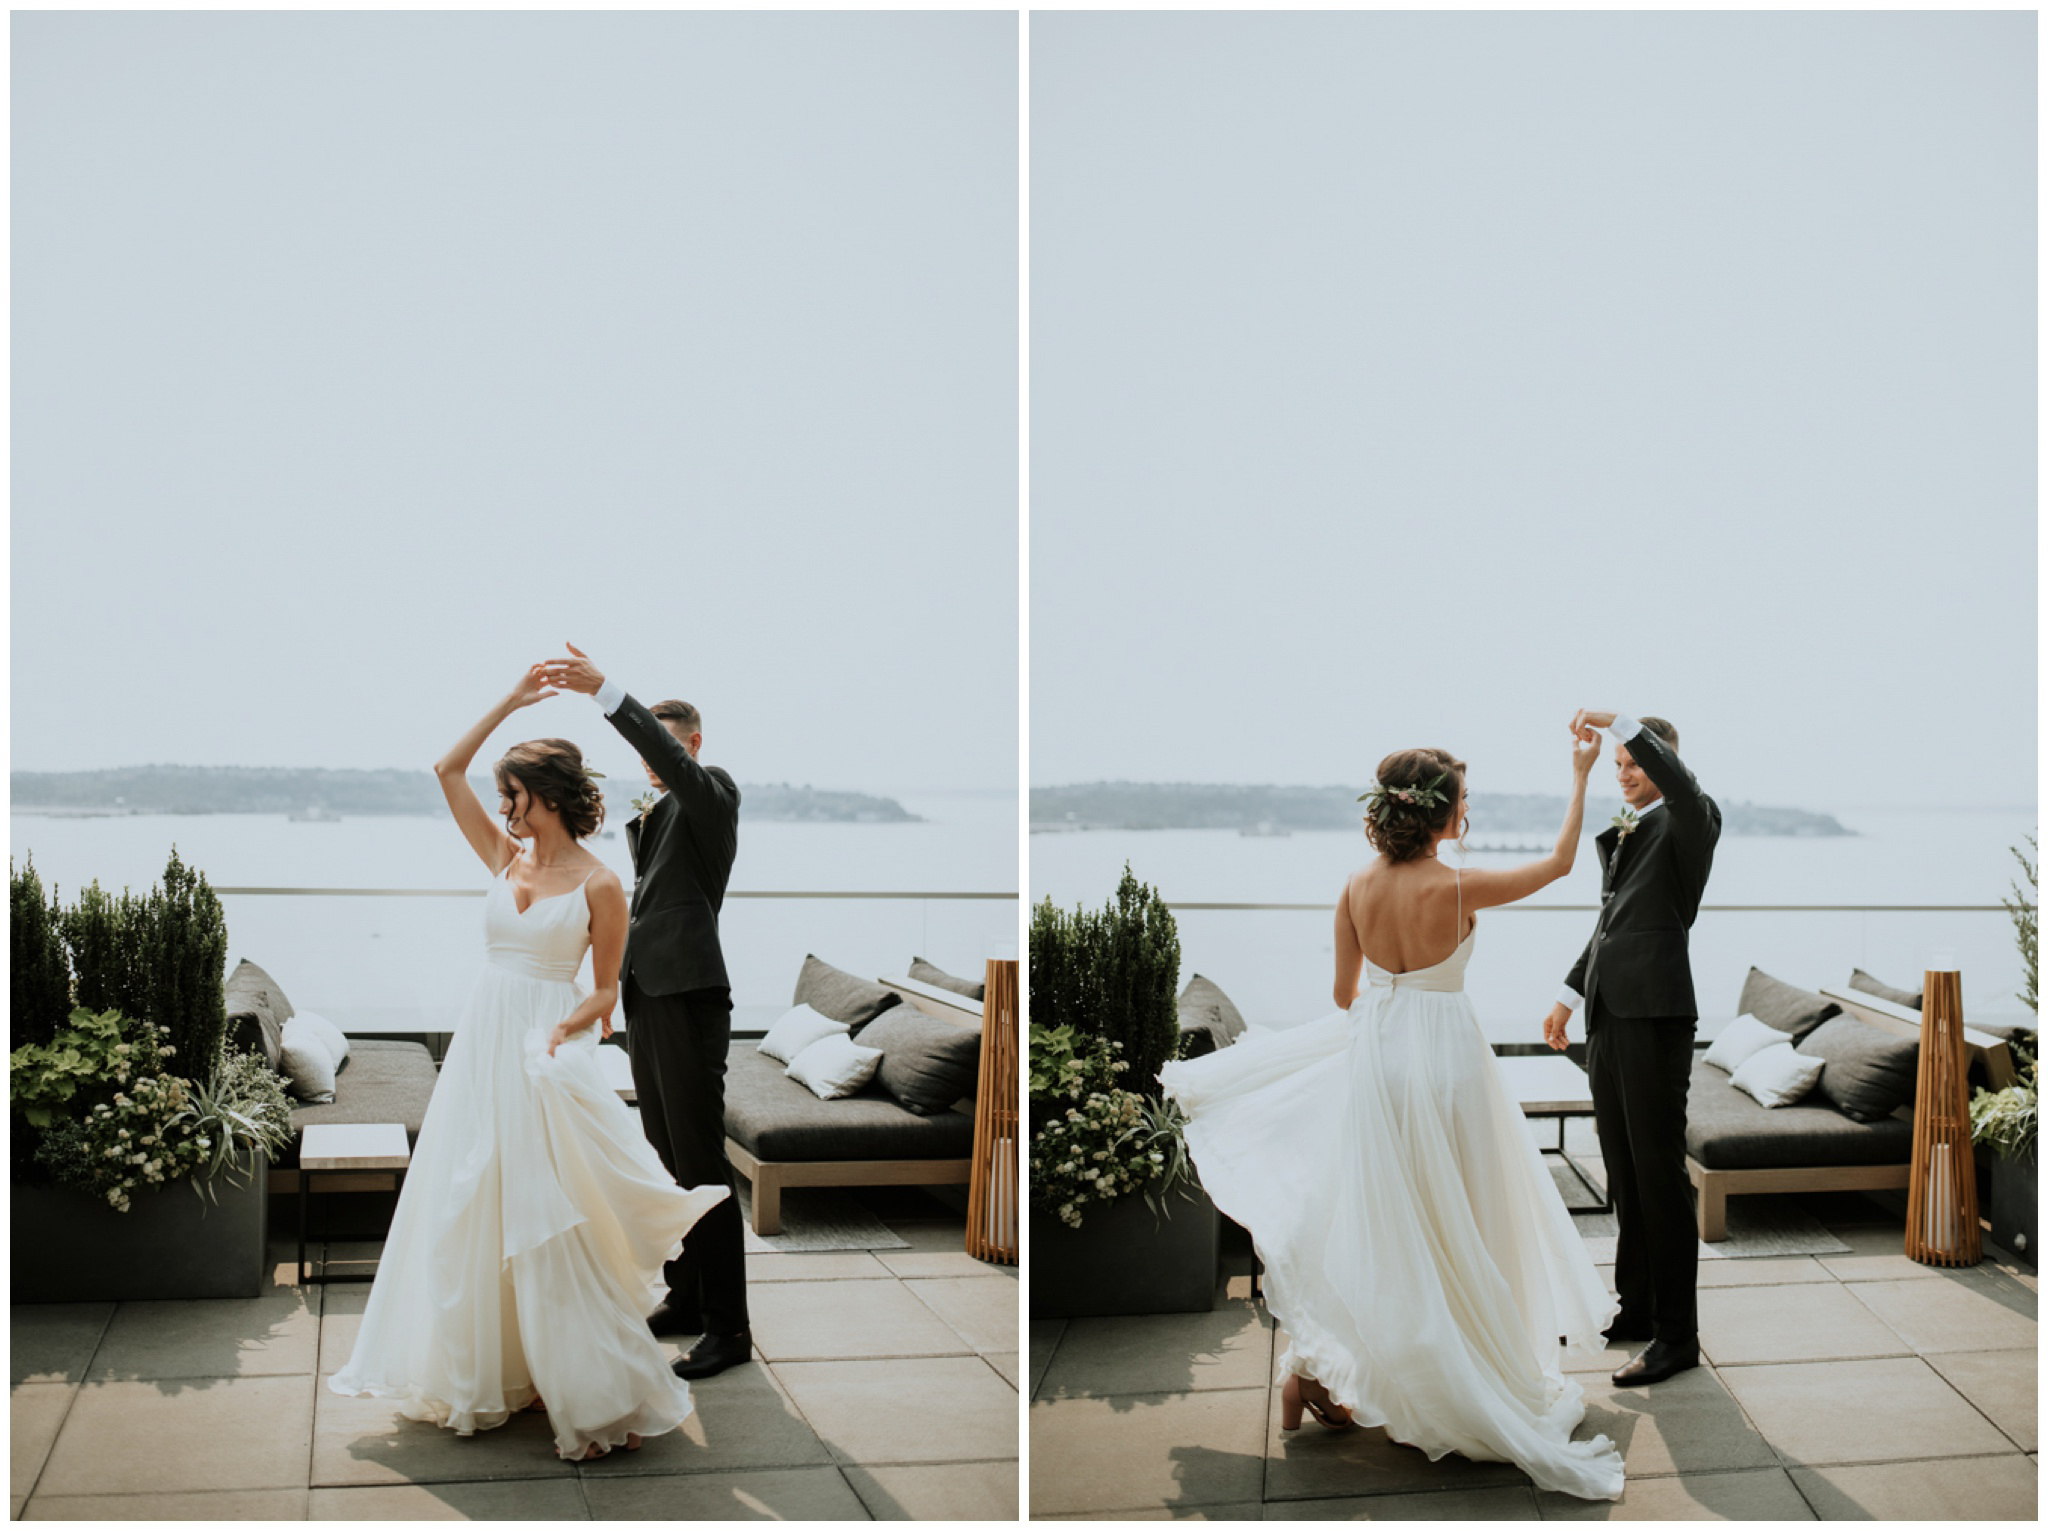 alyssa-keiran-westland-distillery-urban-seattle-wedding-photographer-caitlyn-nikula-53.jpg